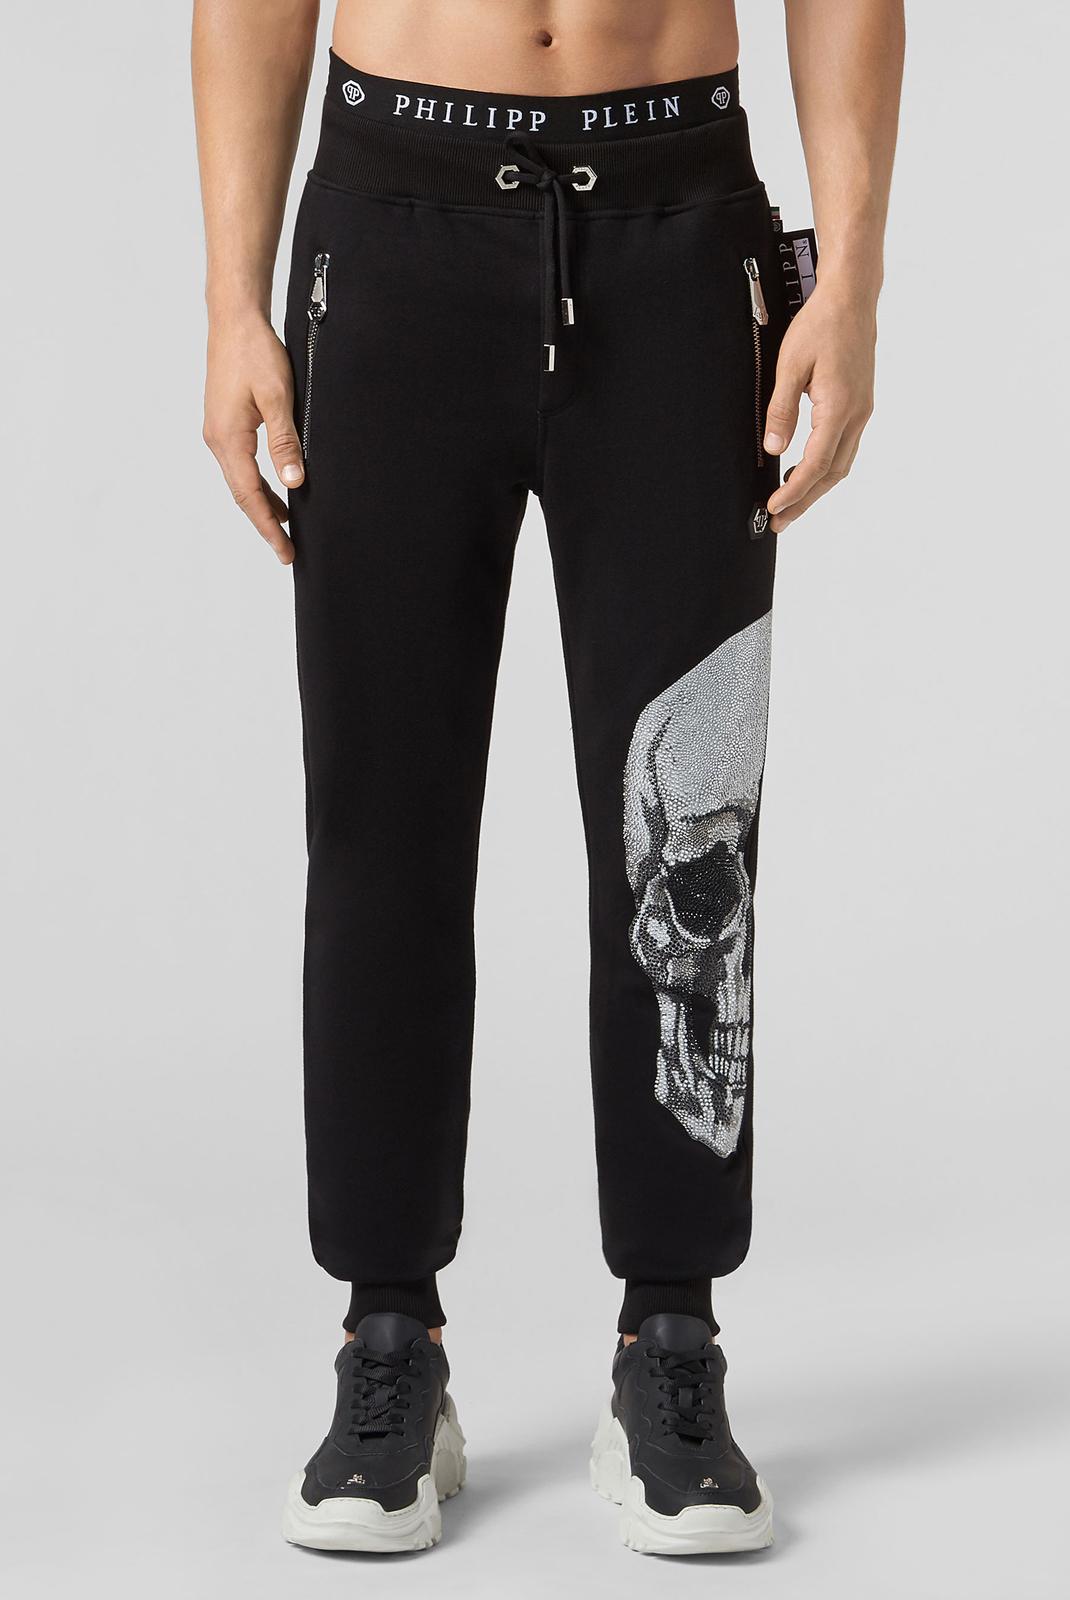 Pantalons sport/streetwear  Philipp plein MJT0939 02 BLACK